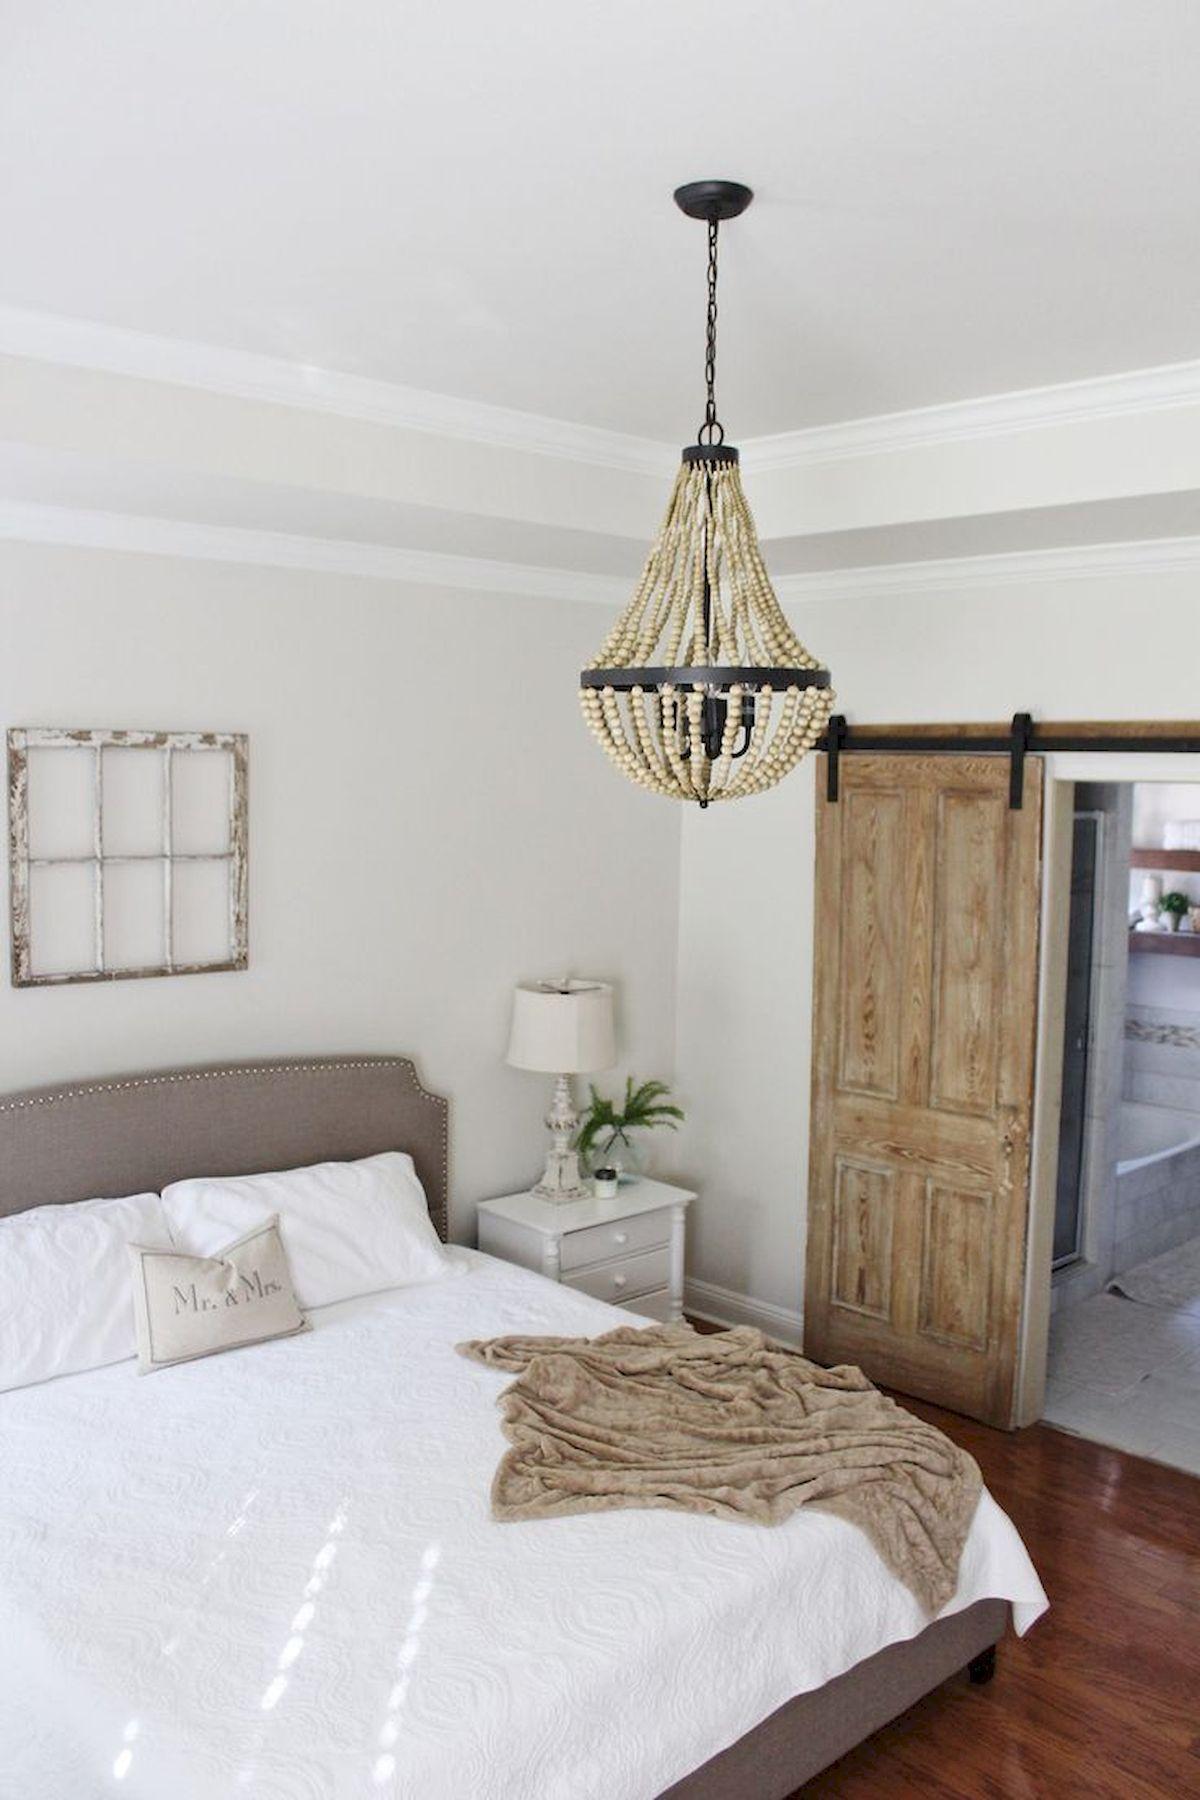 40+ LIGHTING FOR FARMHOUSE BEDROOM DECOR IDEAS AND DESIGN - Aegaea Decor | Modern Bedroom Lighting, Bedroom Light Fixtures, Bedroom Decor